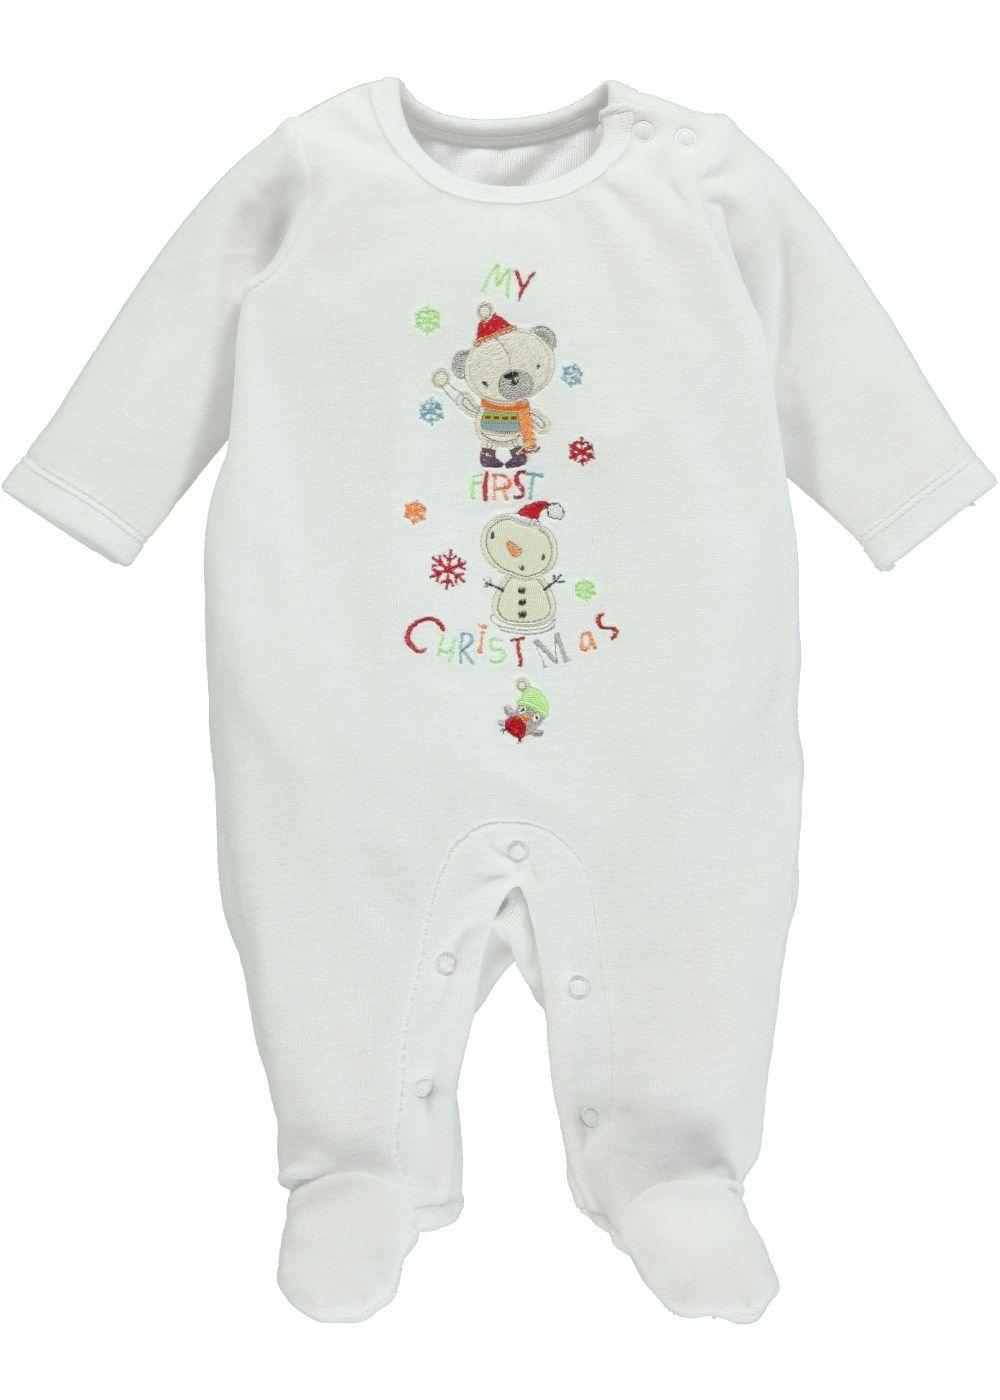 Unisex 'My First Christmas' Sleepsuit - Matalan